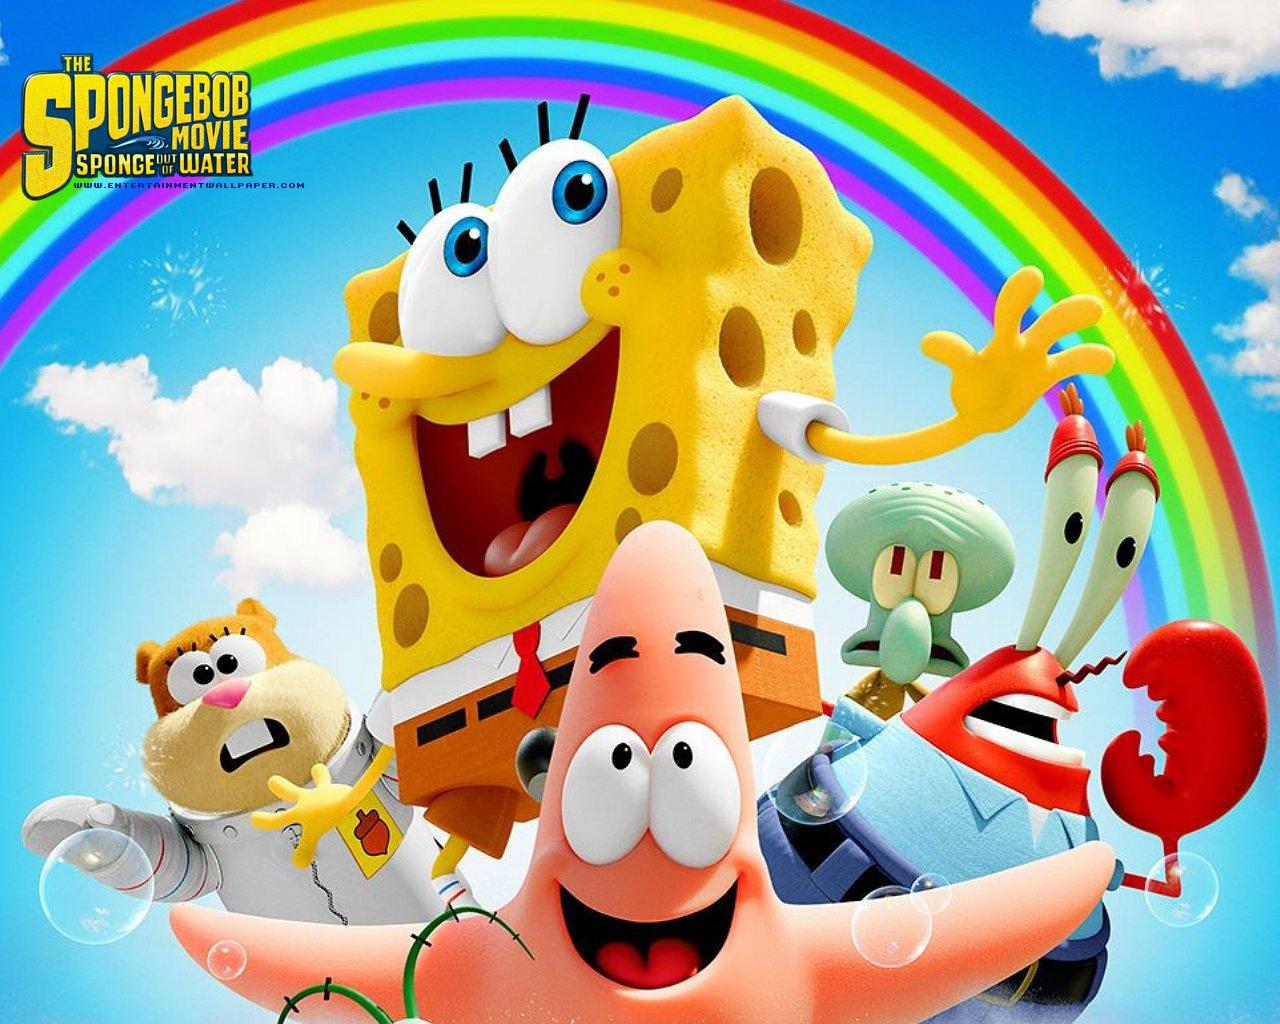 The Spongebob Movie - Spongebob Movie Sponge Out Of Water , HD Wallpaper & Backgrounds